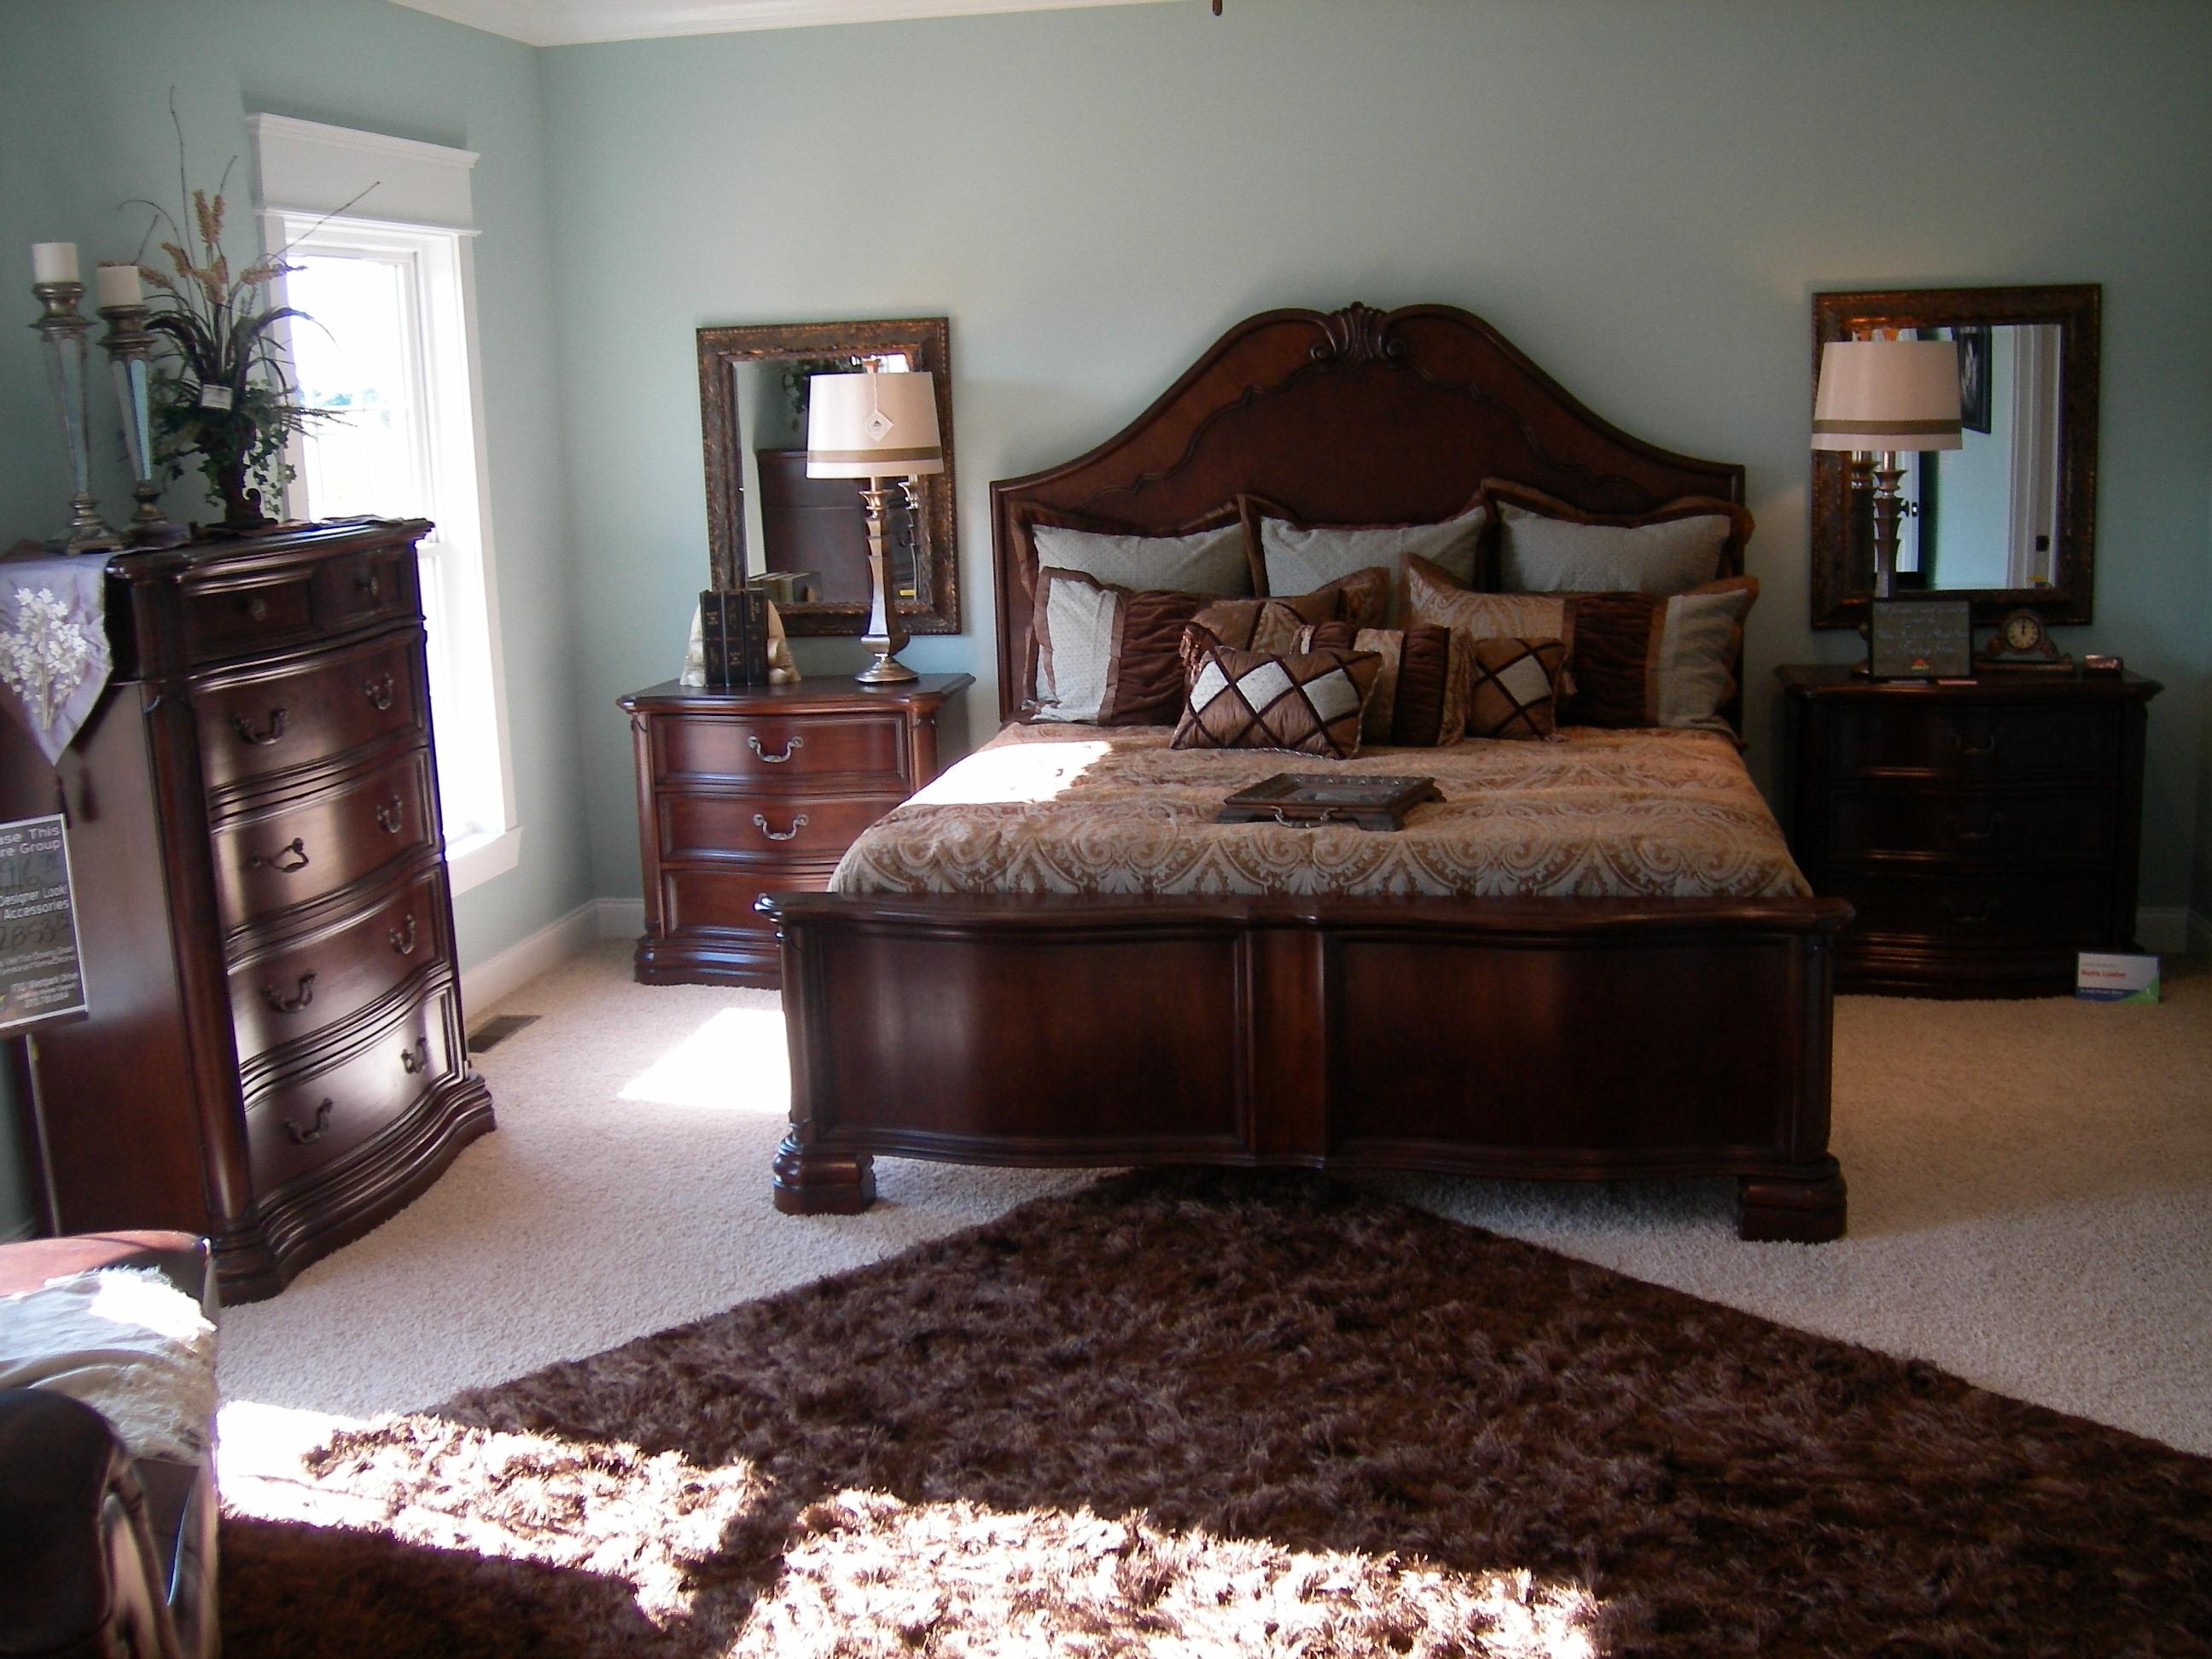 Ashley Furniture Homestore Donates 5 000 To St Jude